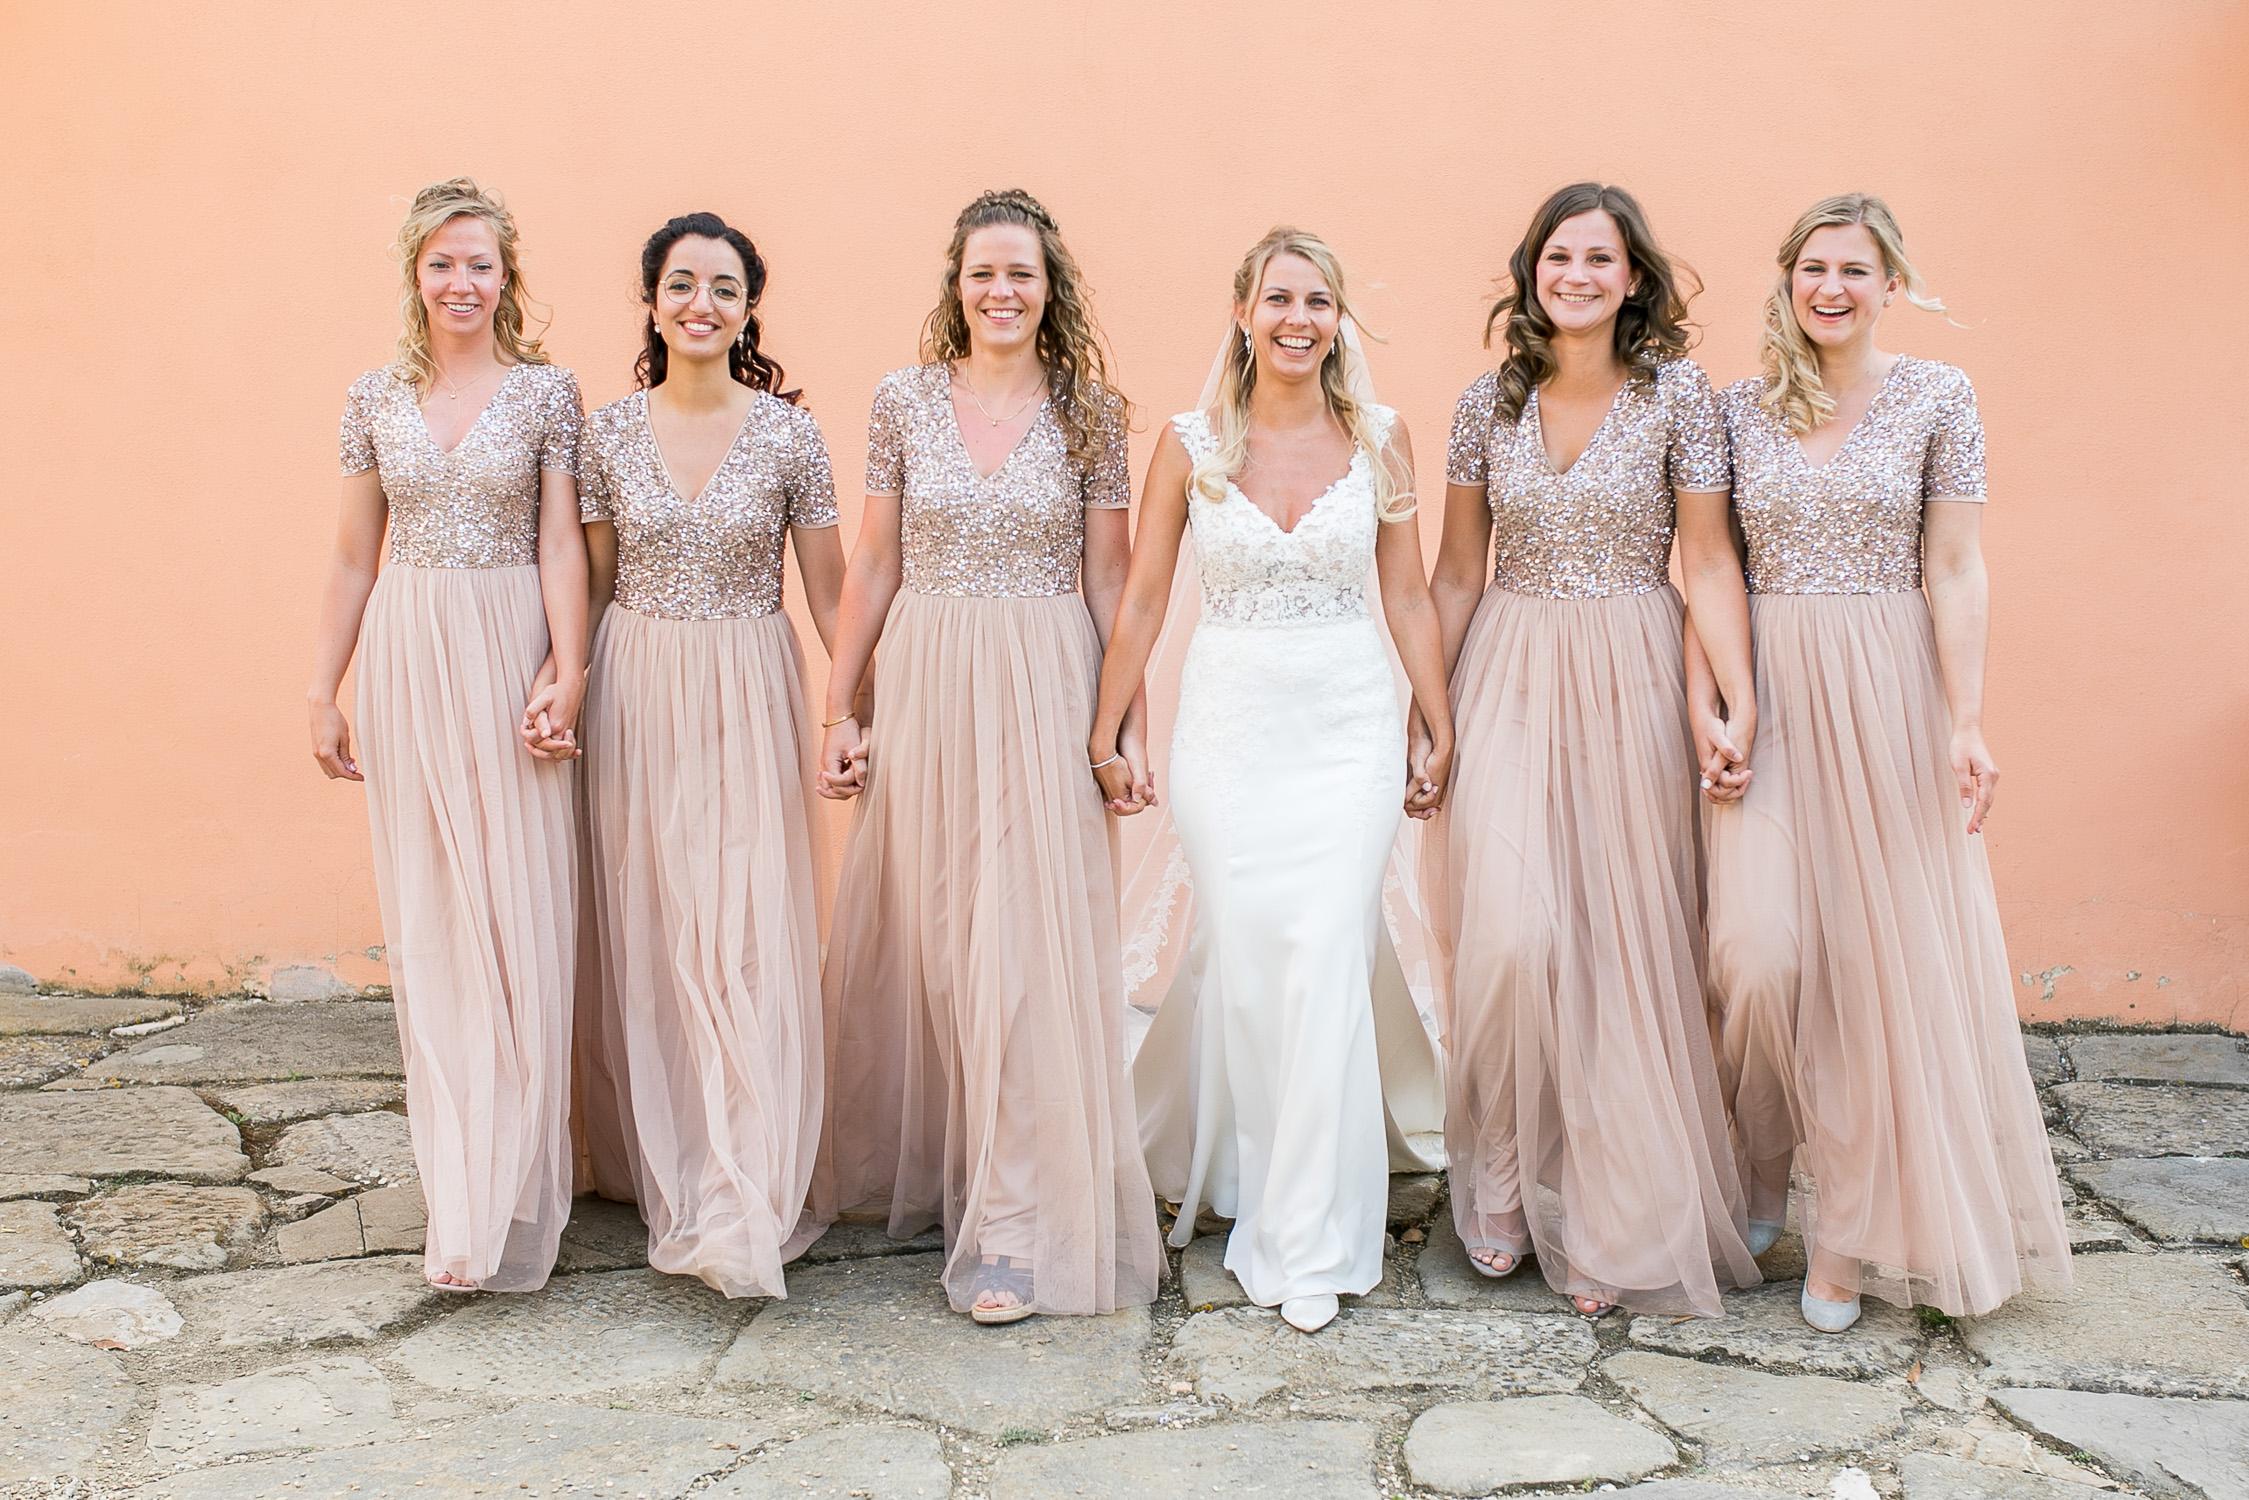 Jasmijn Brussé Fotografie - Bruiloft in Toscane-83